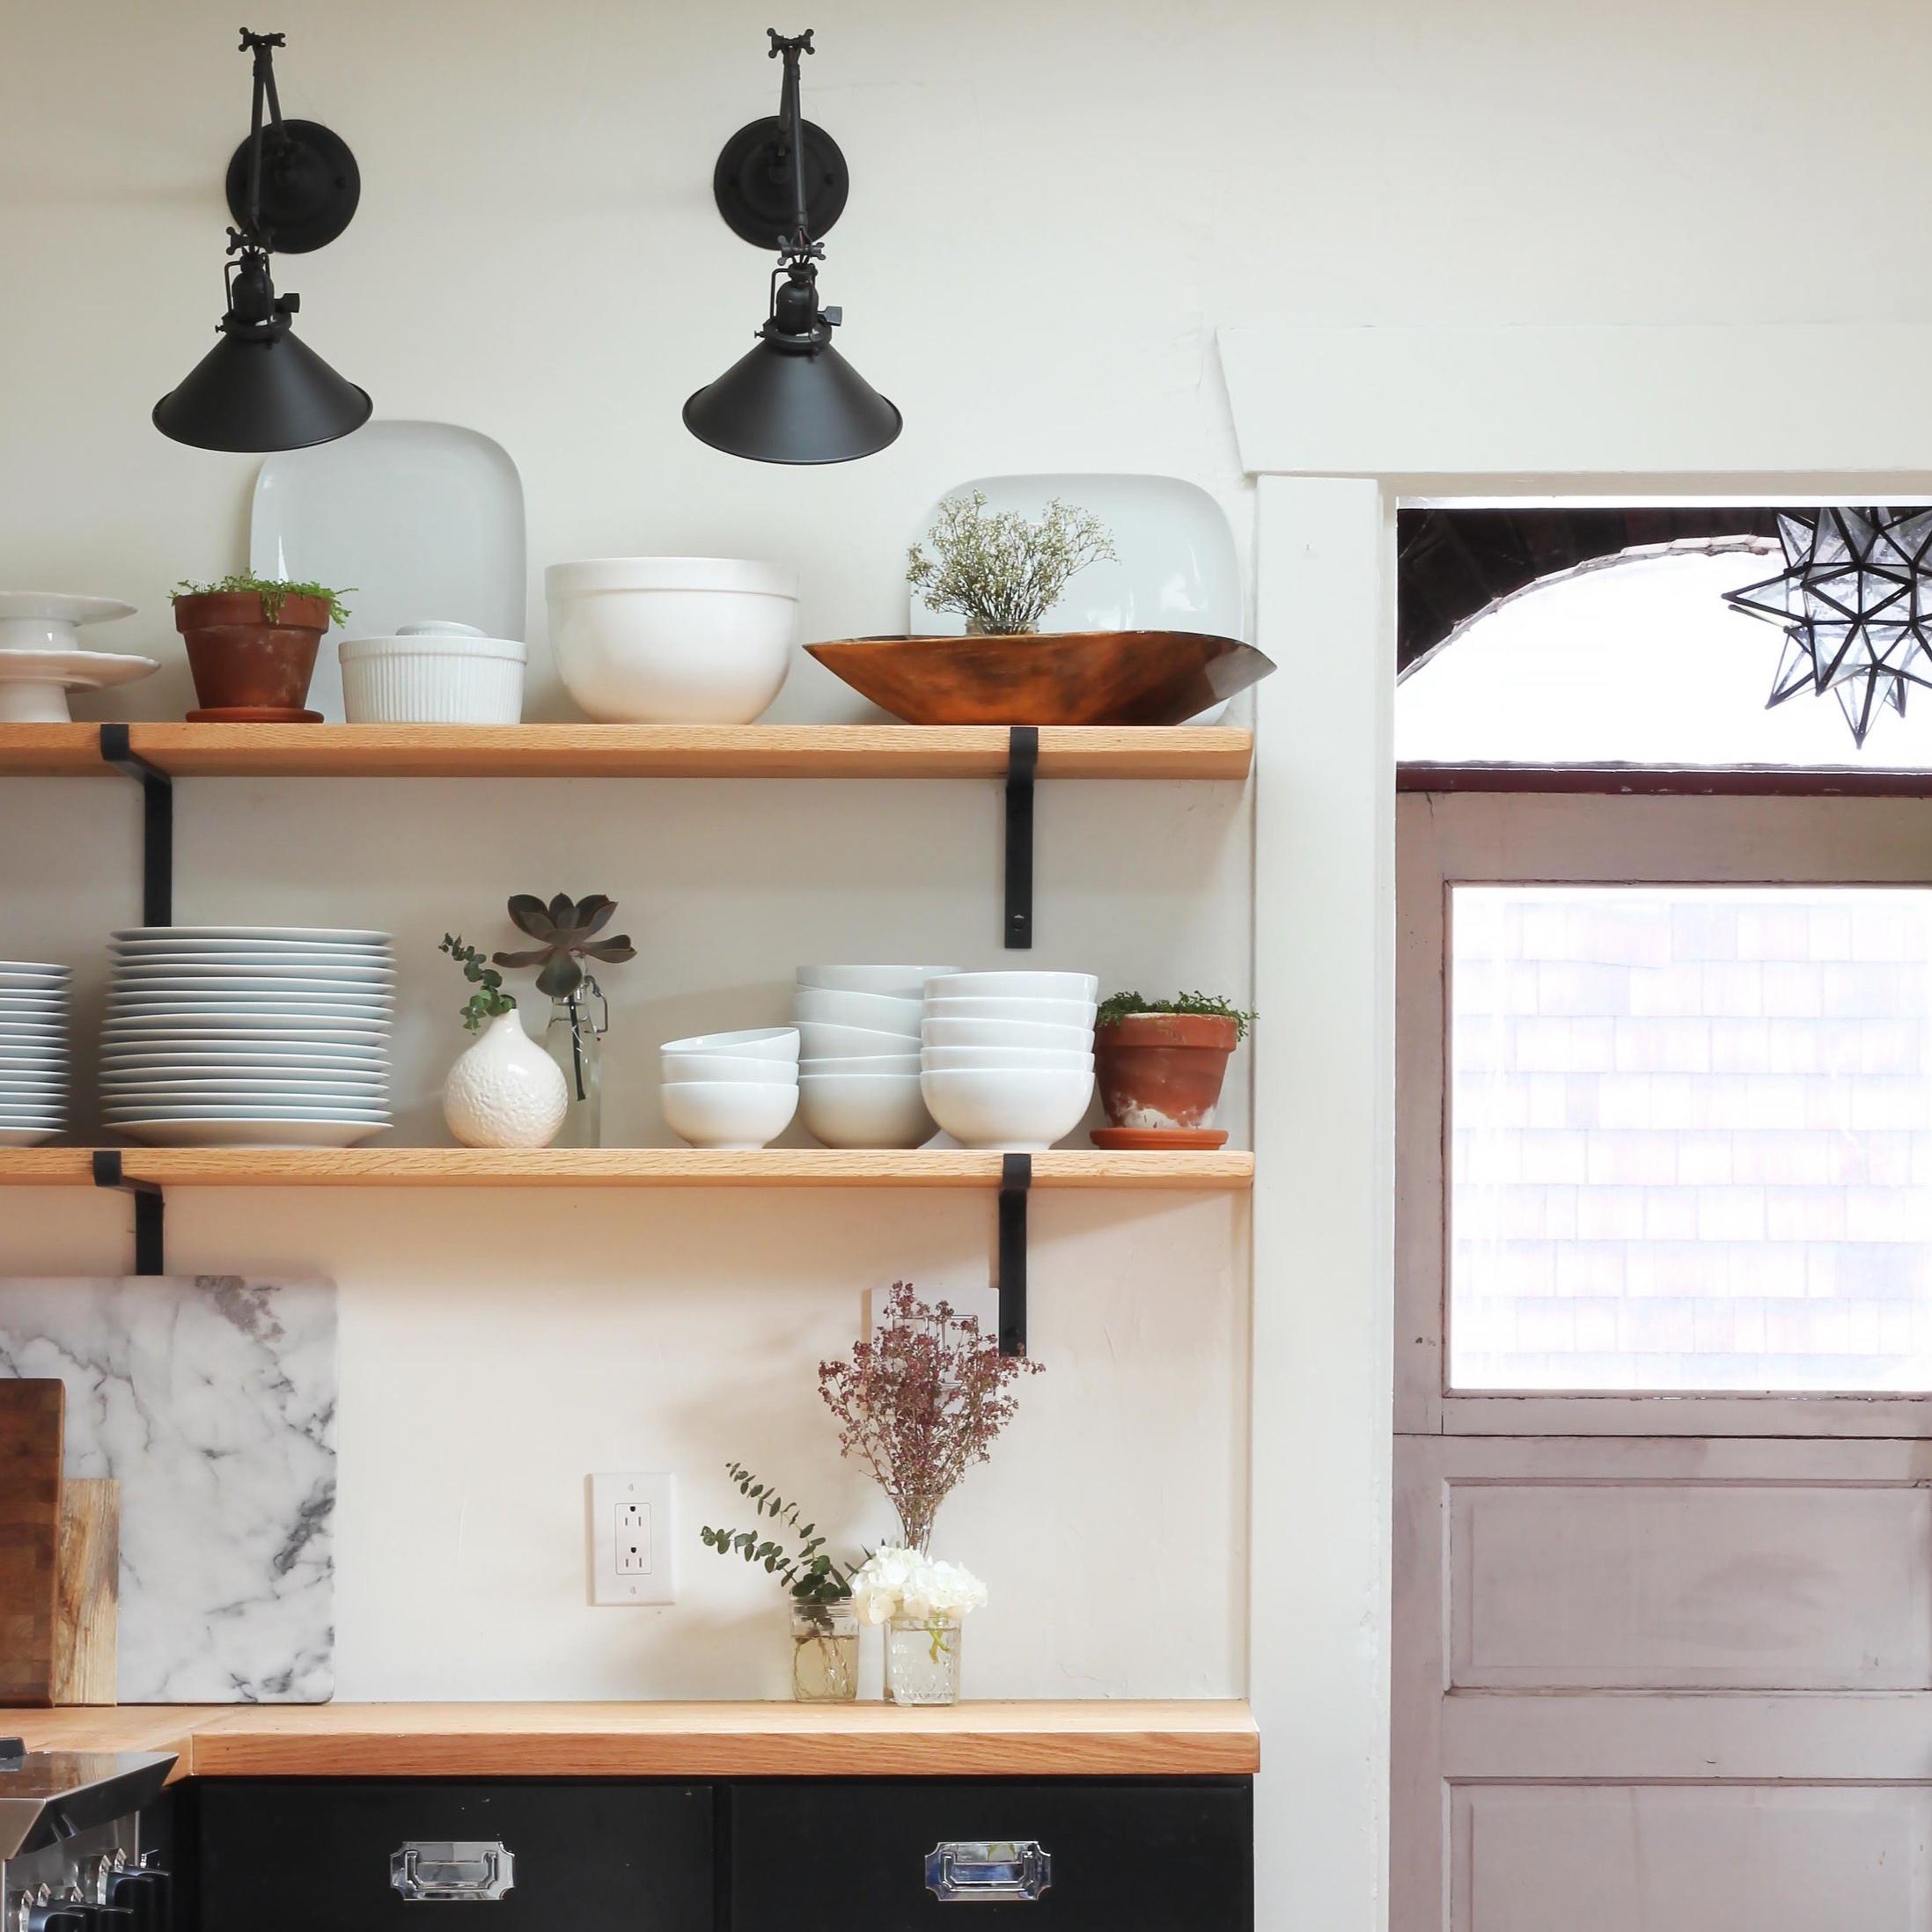 The+Grit+and+Polish+-+Dexter+Kitchen+Renovation+Open+Shelves.jpg